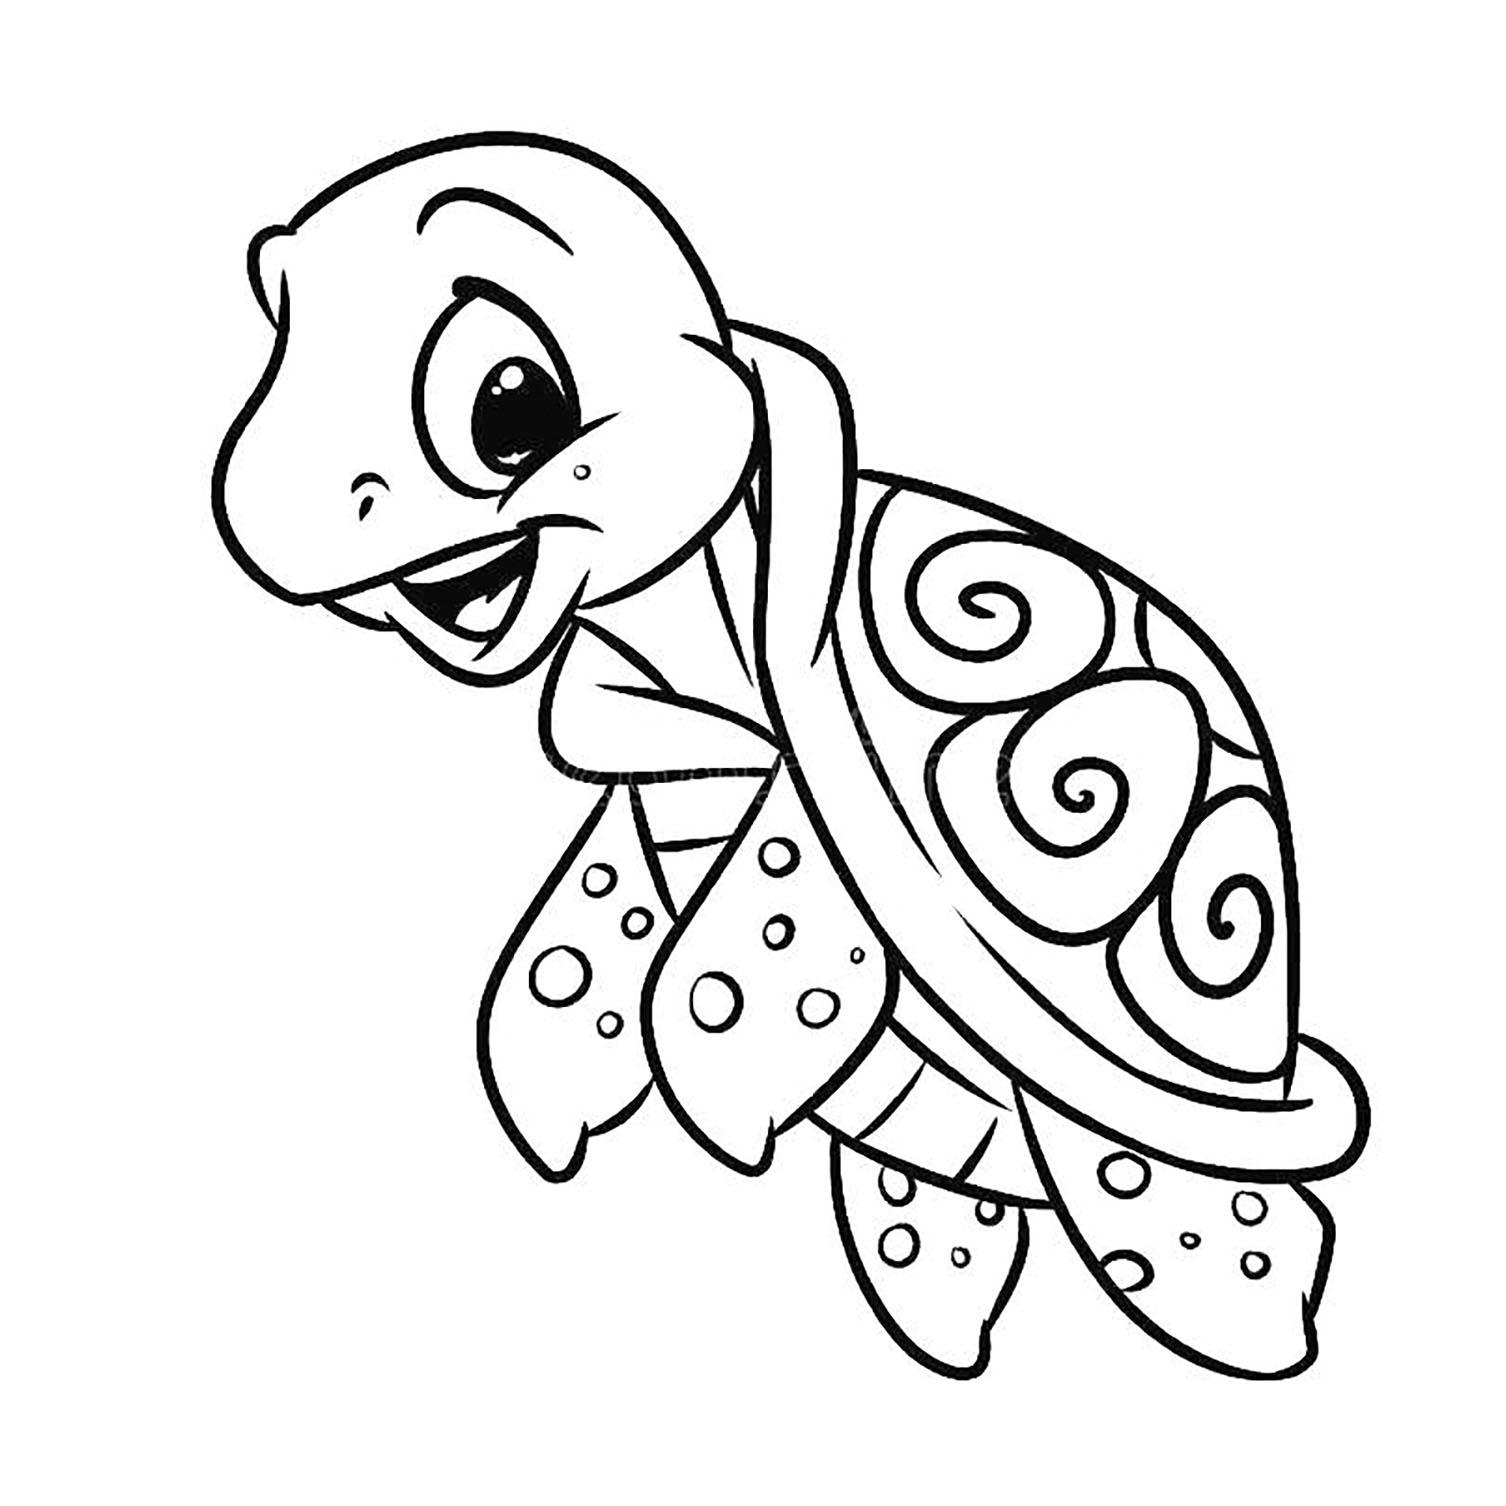 turtle colouring sheets sea turtle coloring pages getcoloringpagescom colouring sheets turtle